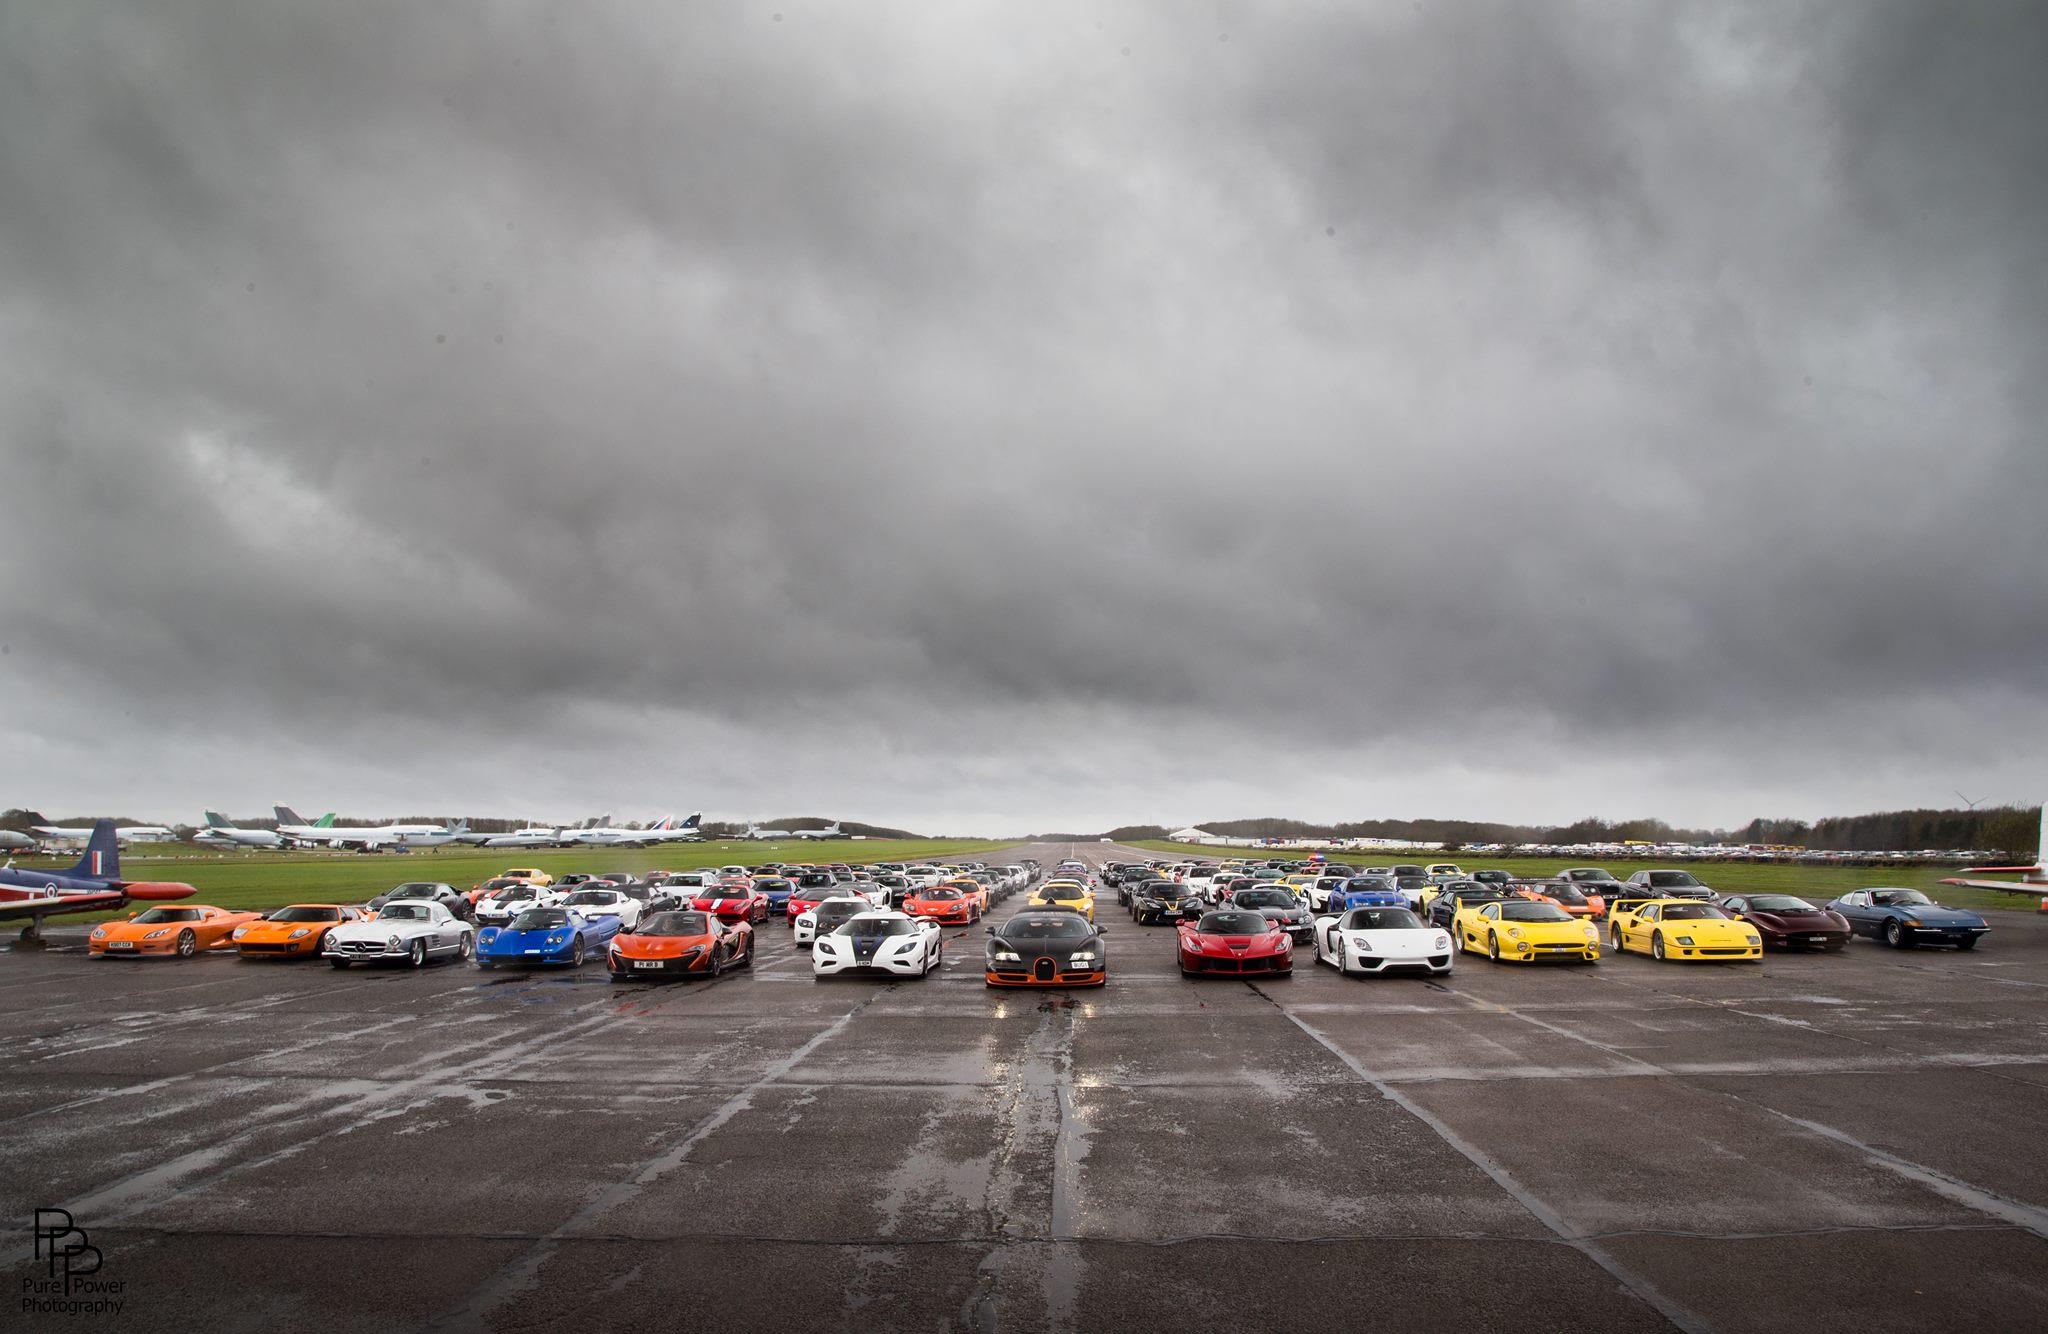 Secret Supercar Meet Is Where Hypercars And Supercars Race